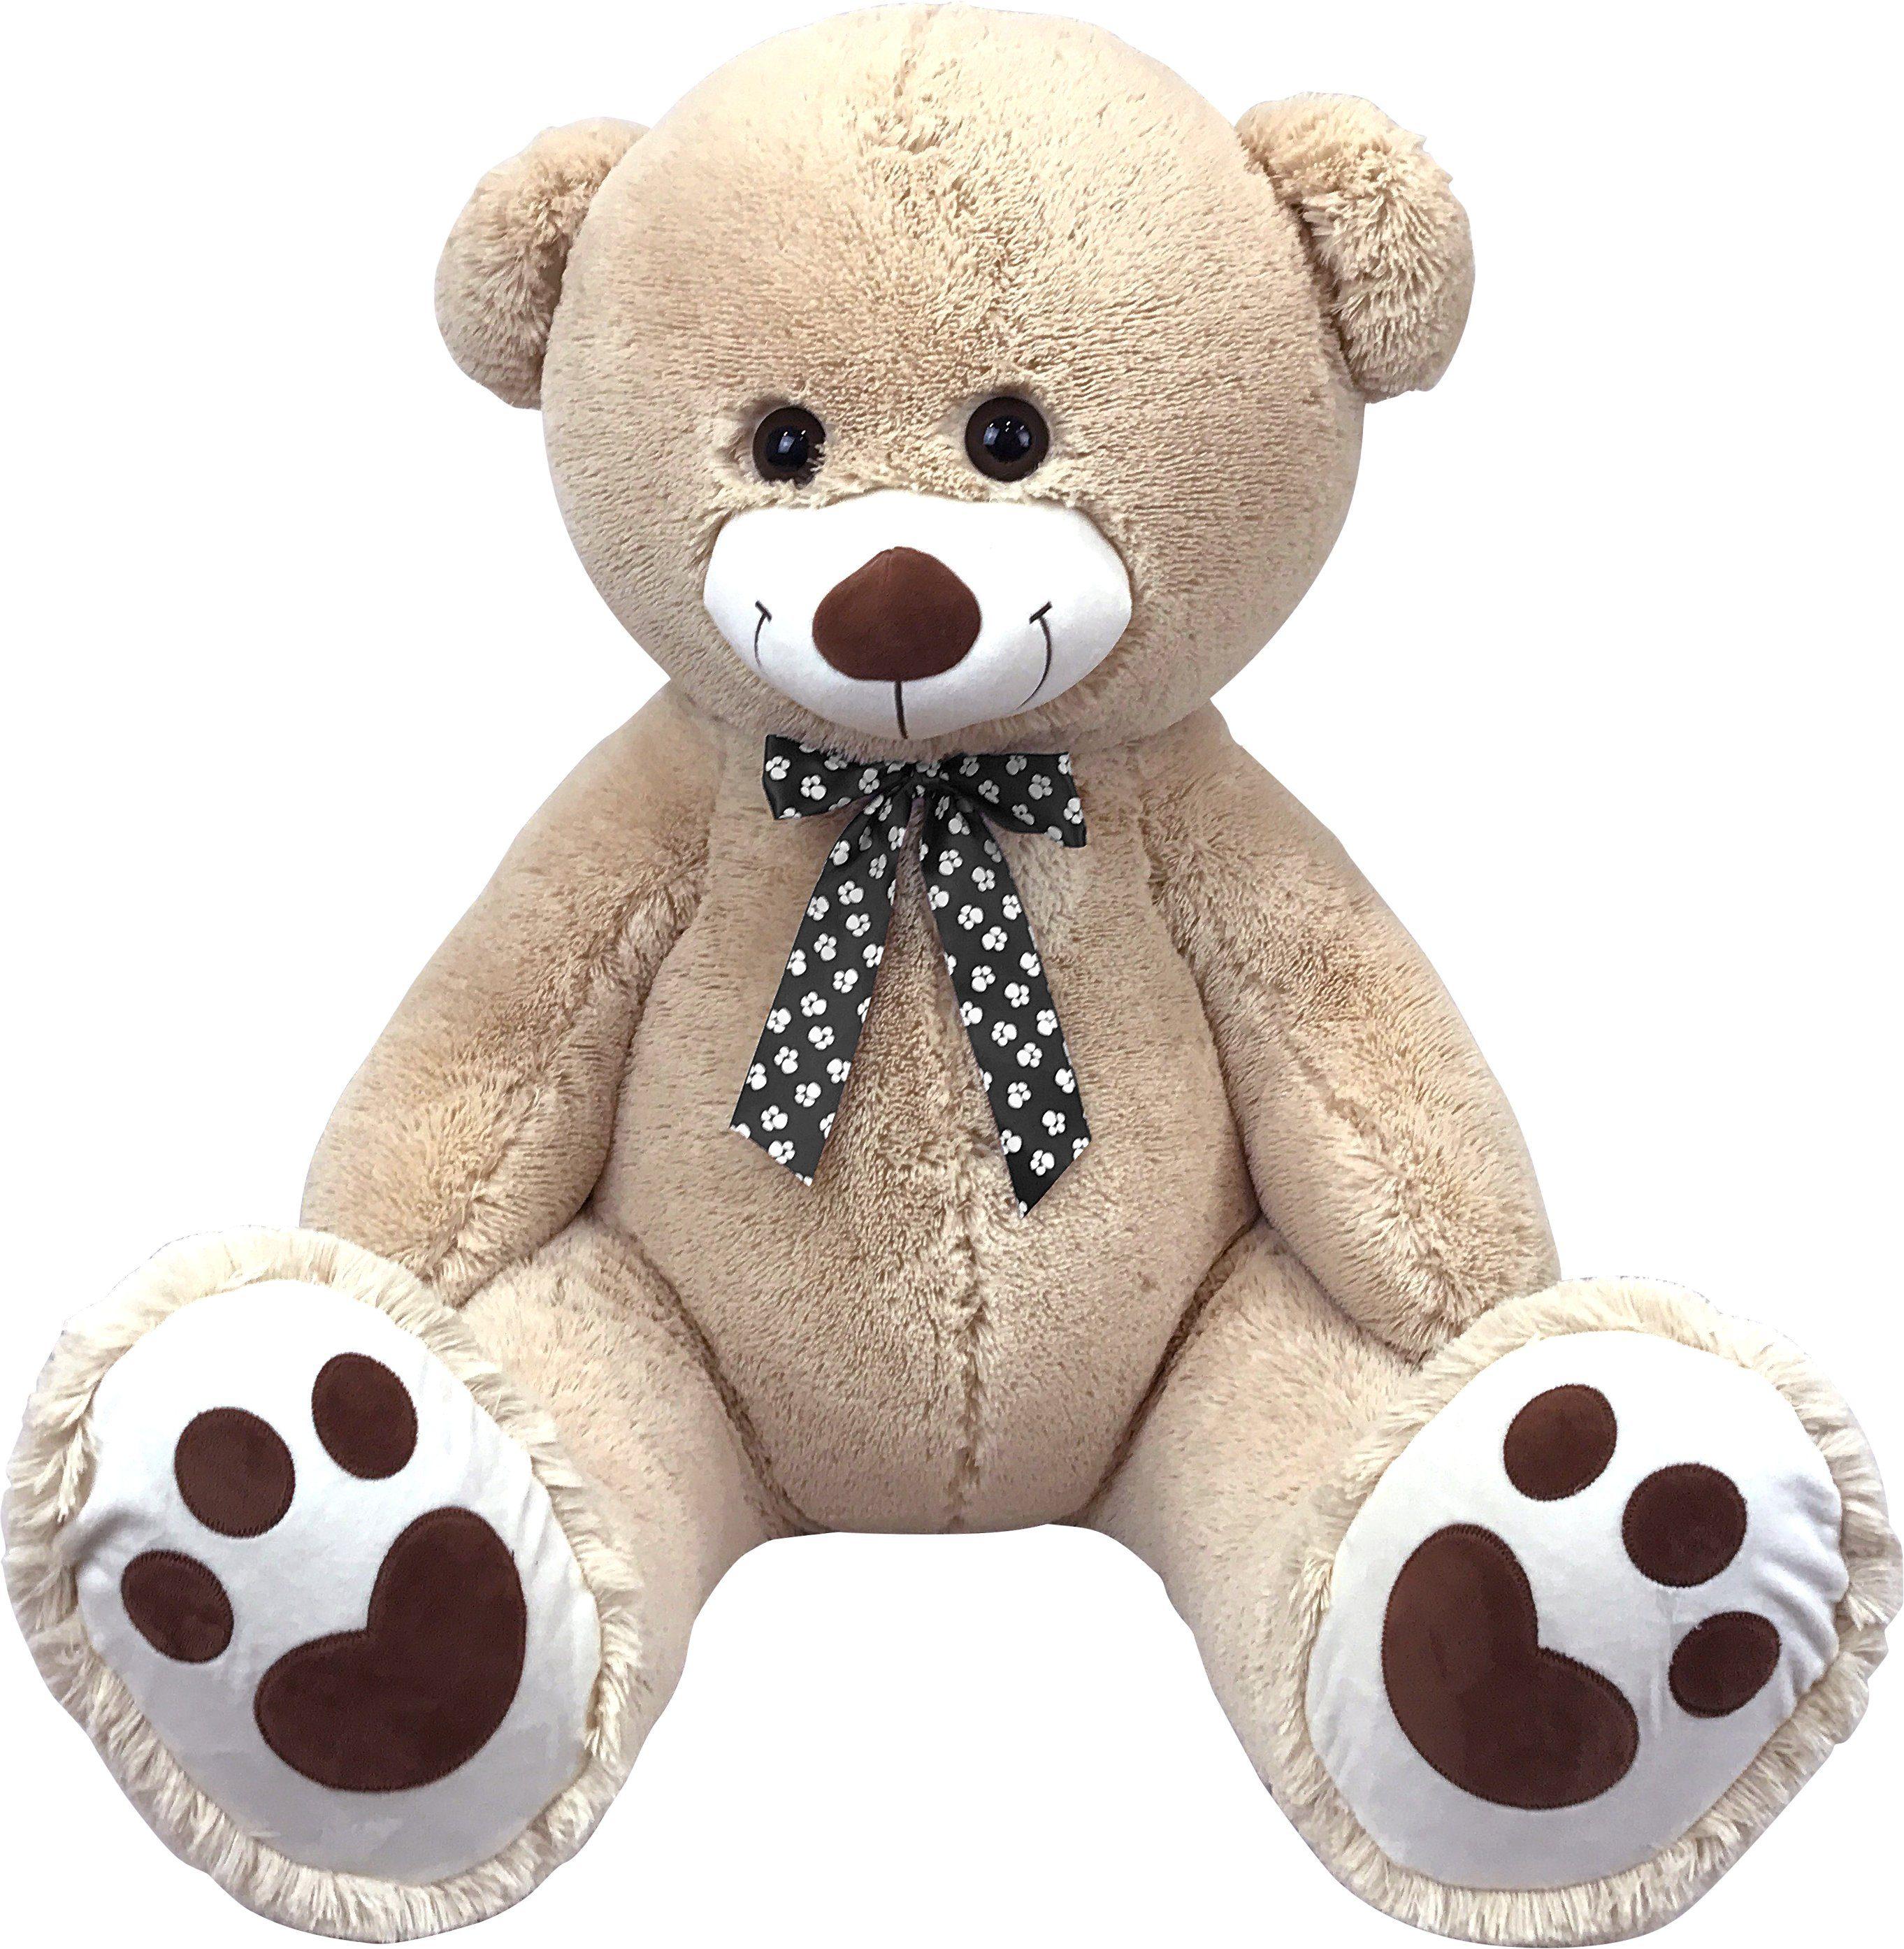 inflate-a-mals Großes Kuscheltier zum Aufblasen, Bär Spielfreund »My Bear Pal«